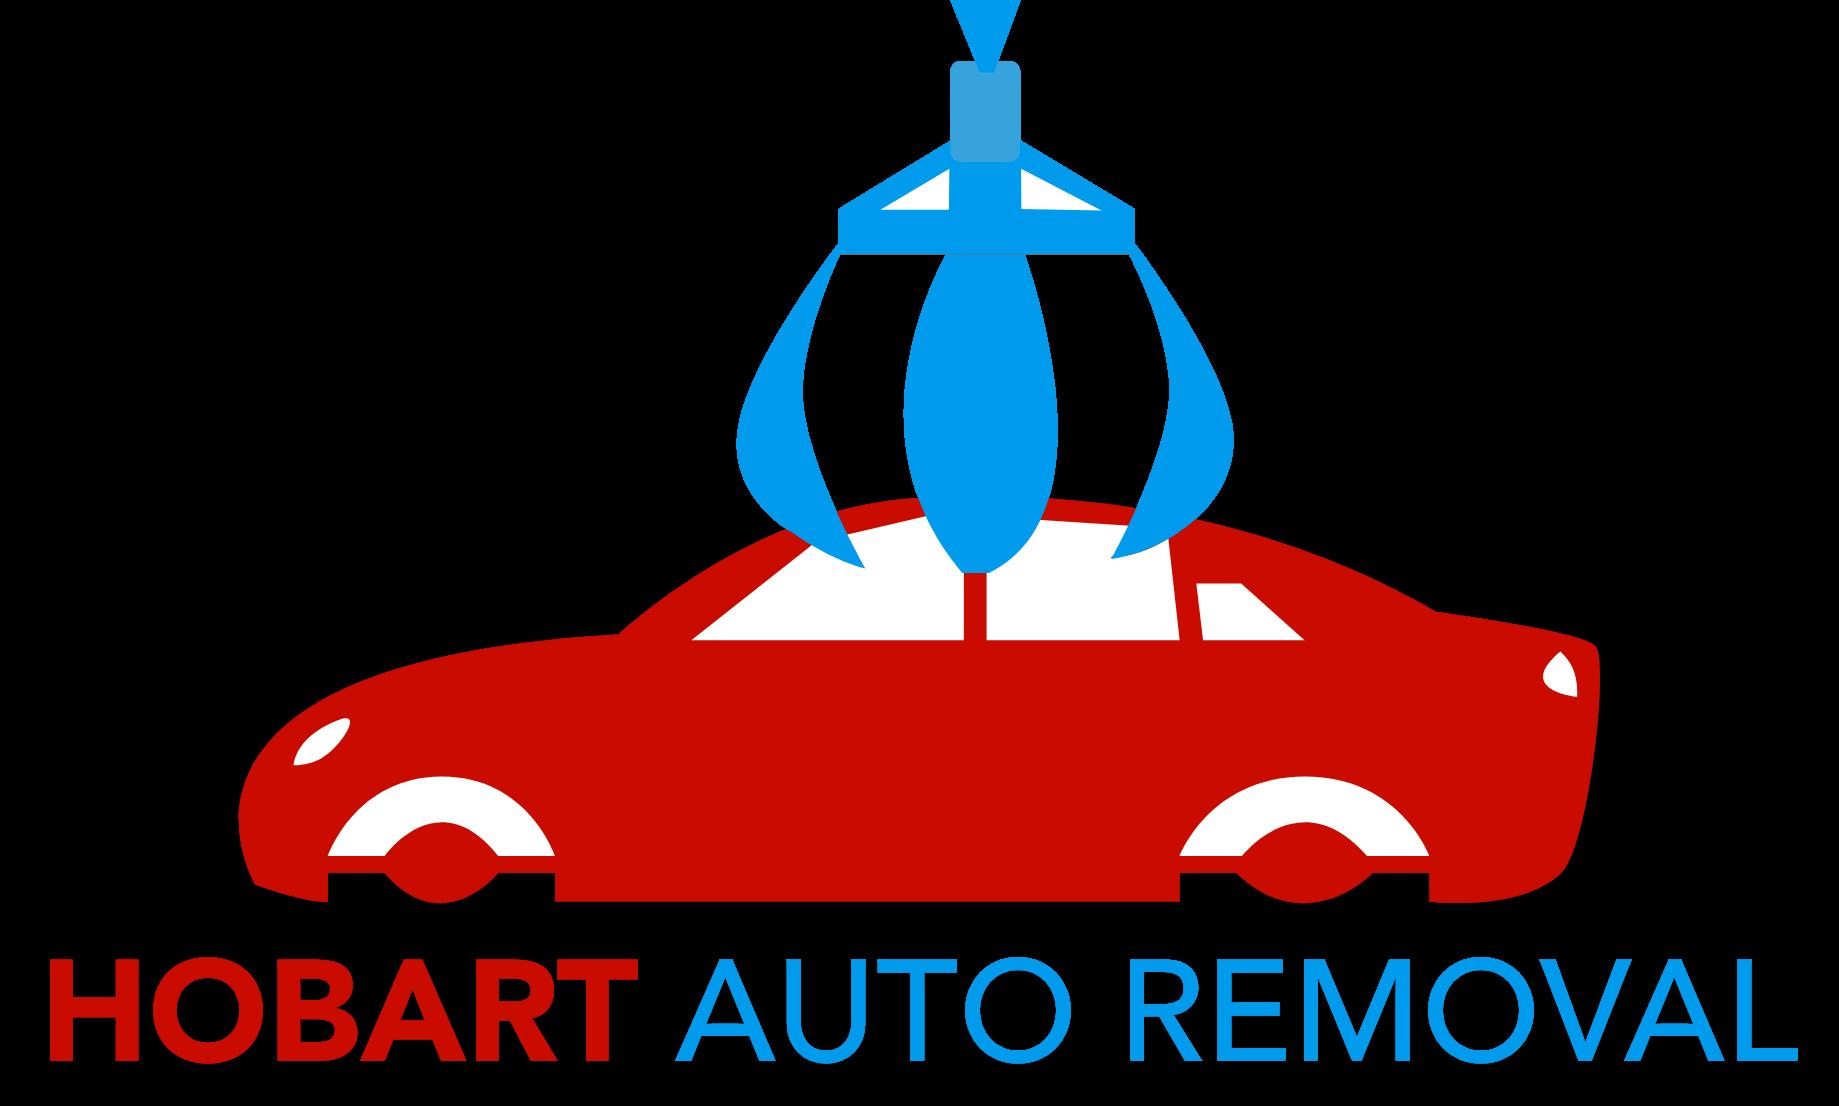 Cash for Scrap cars hobart